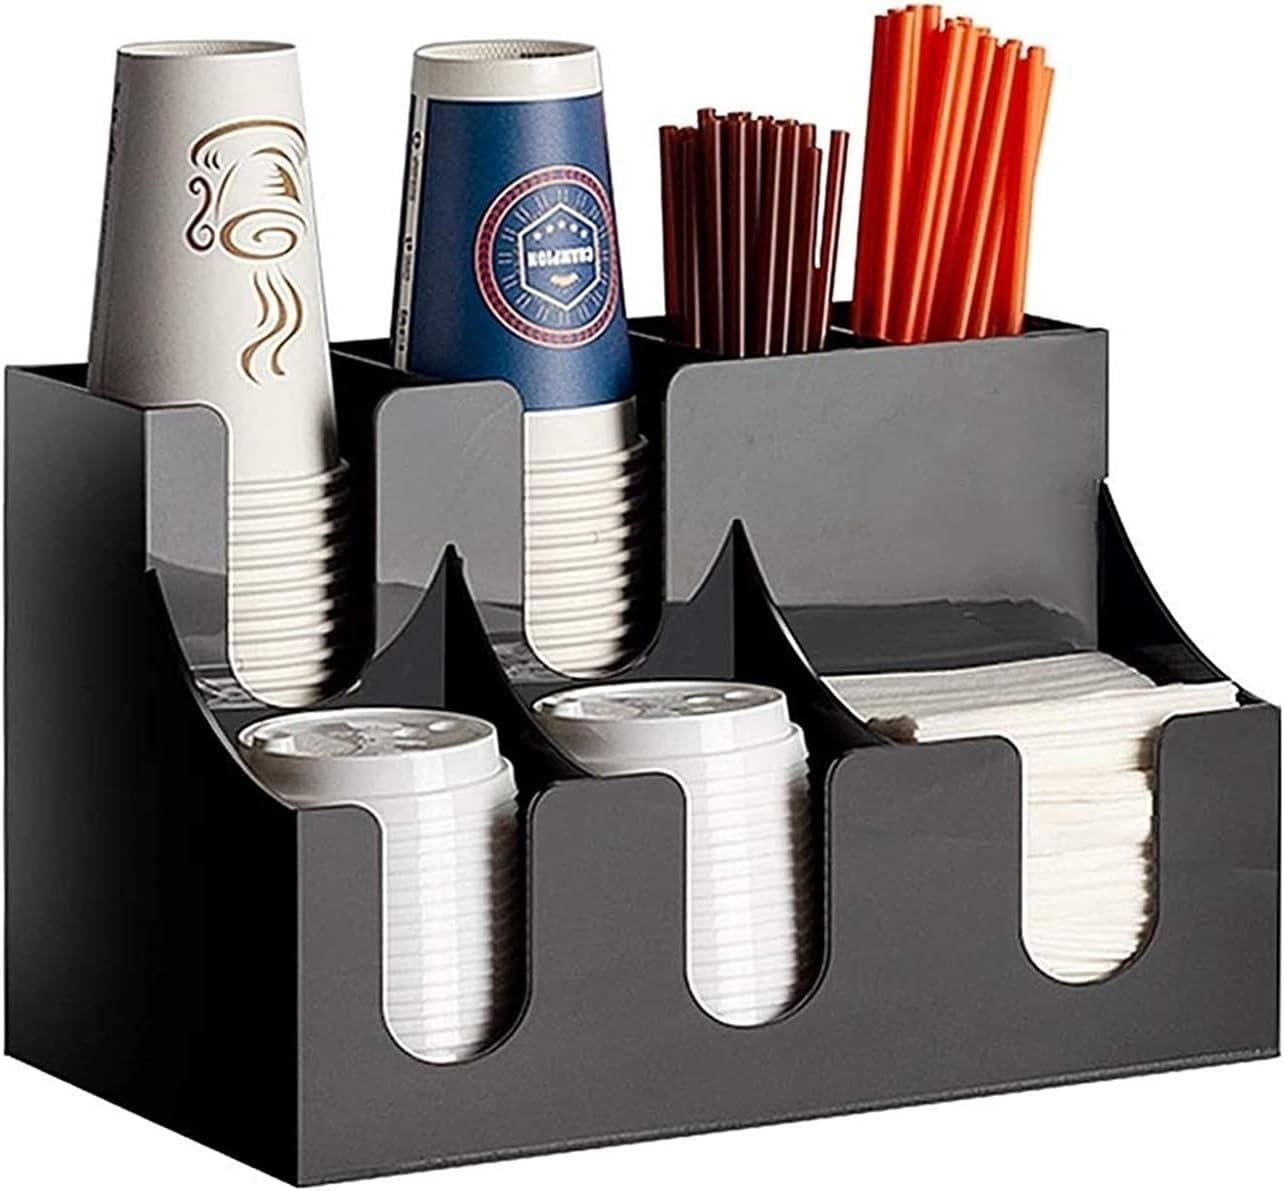 ZXNRTU Mail order Lightweight and Durable Coffee Condiment Direct sale of manufacturer 7 Organizer Com